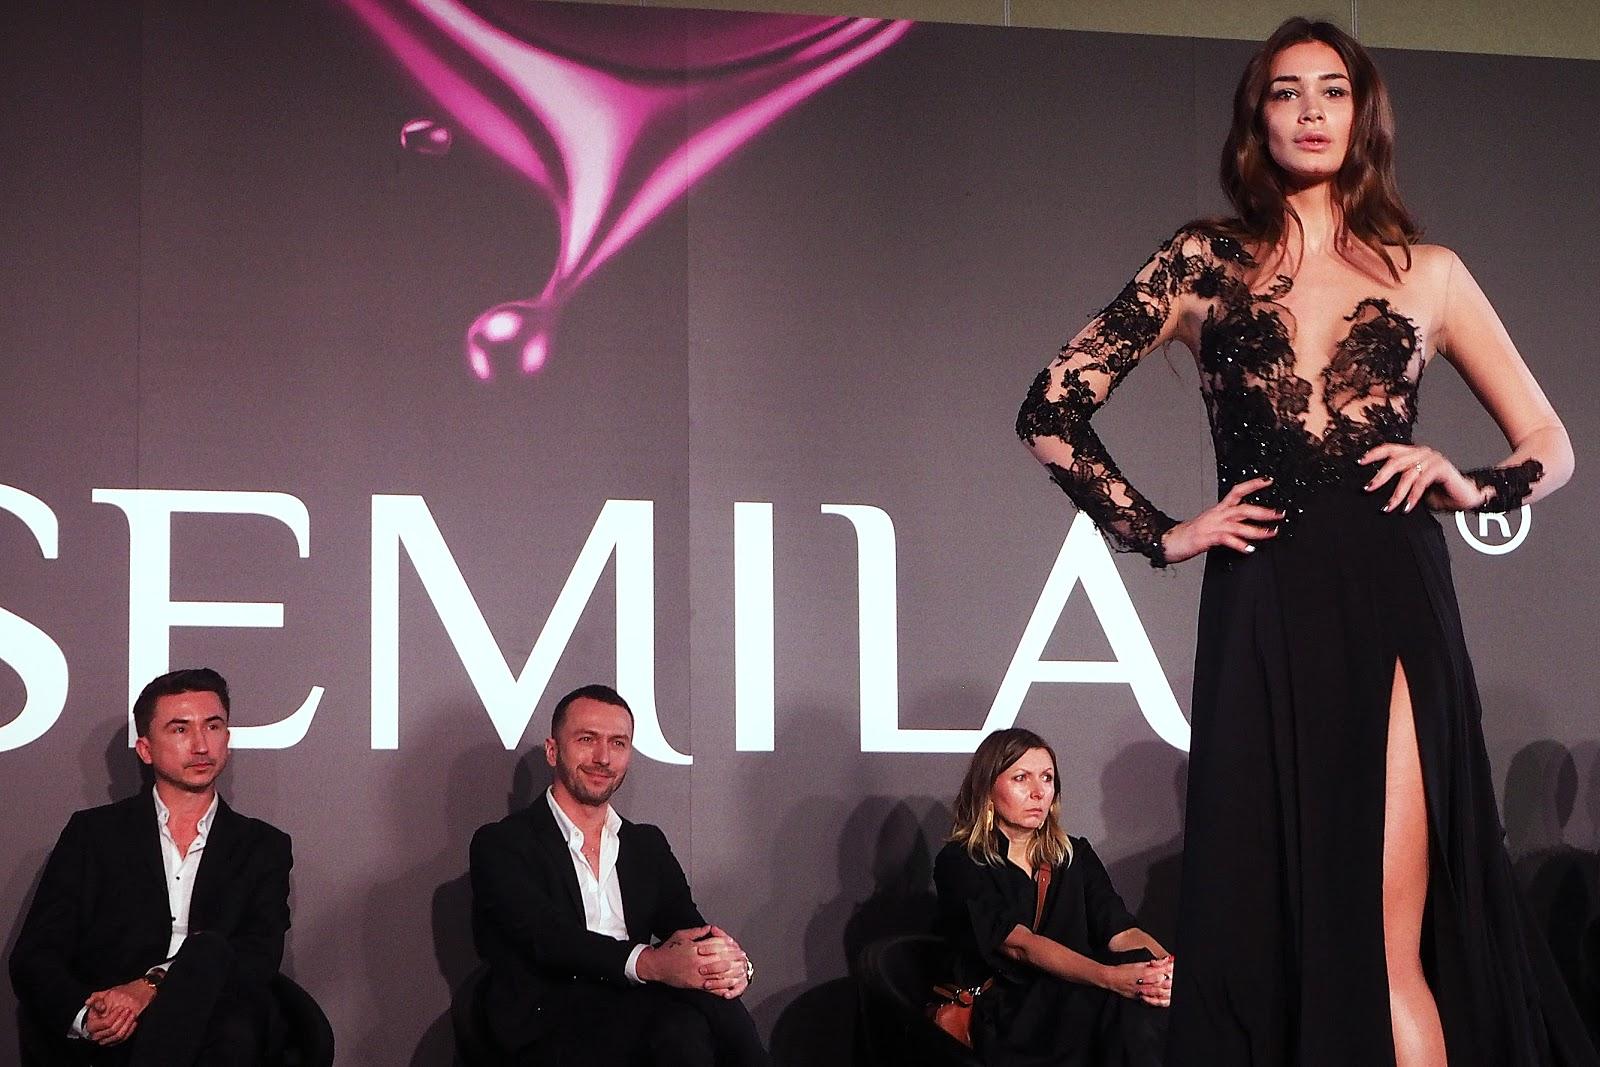 semilac inspiracja modą